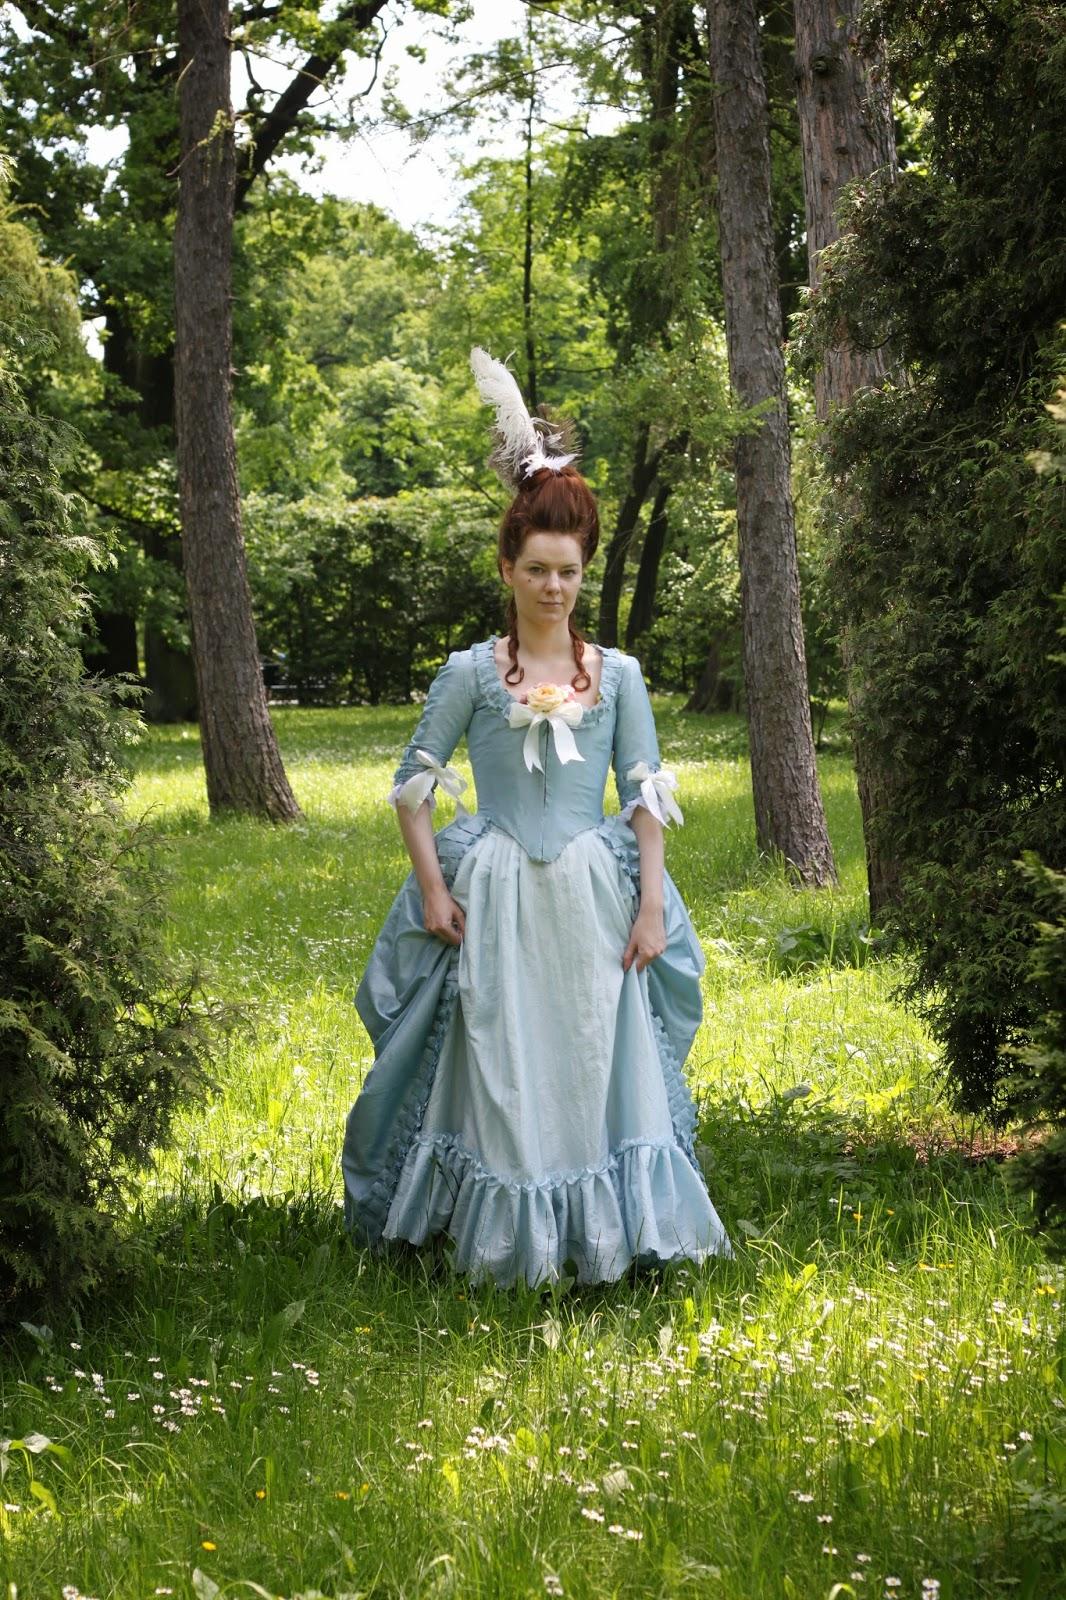 http://kostiumiglanitka.blogspot.com/2014/05/reklama-fermy-strusiej.html